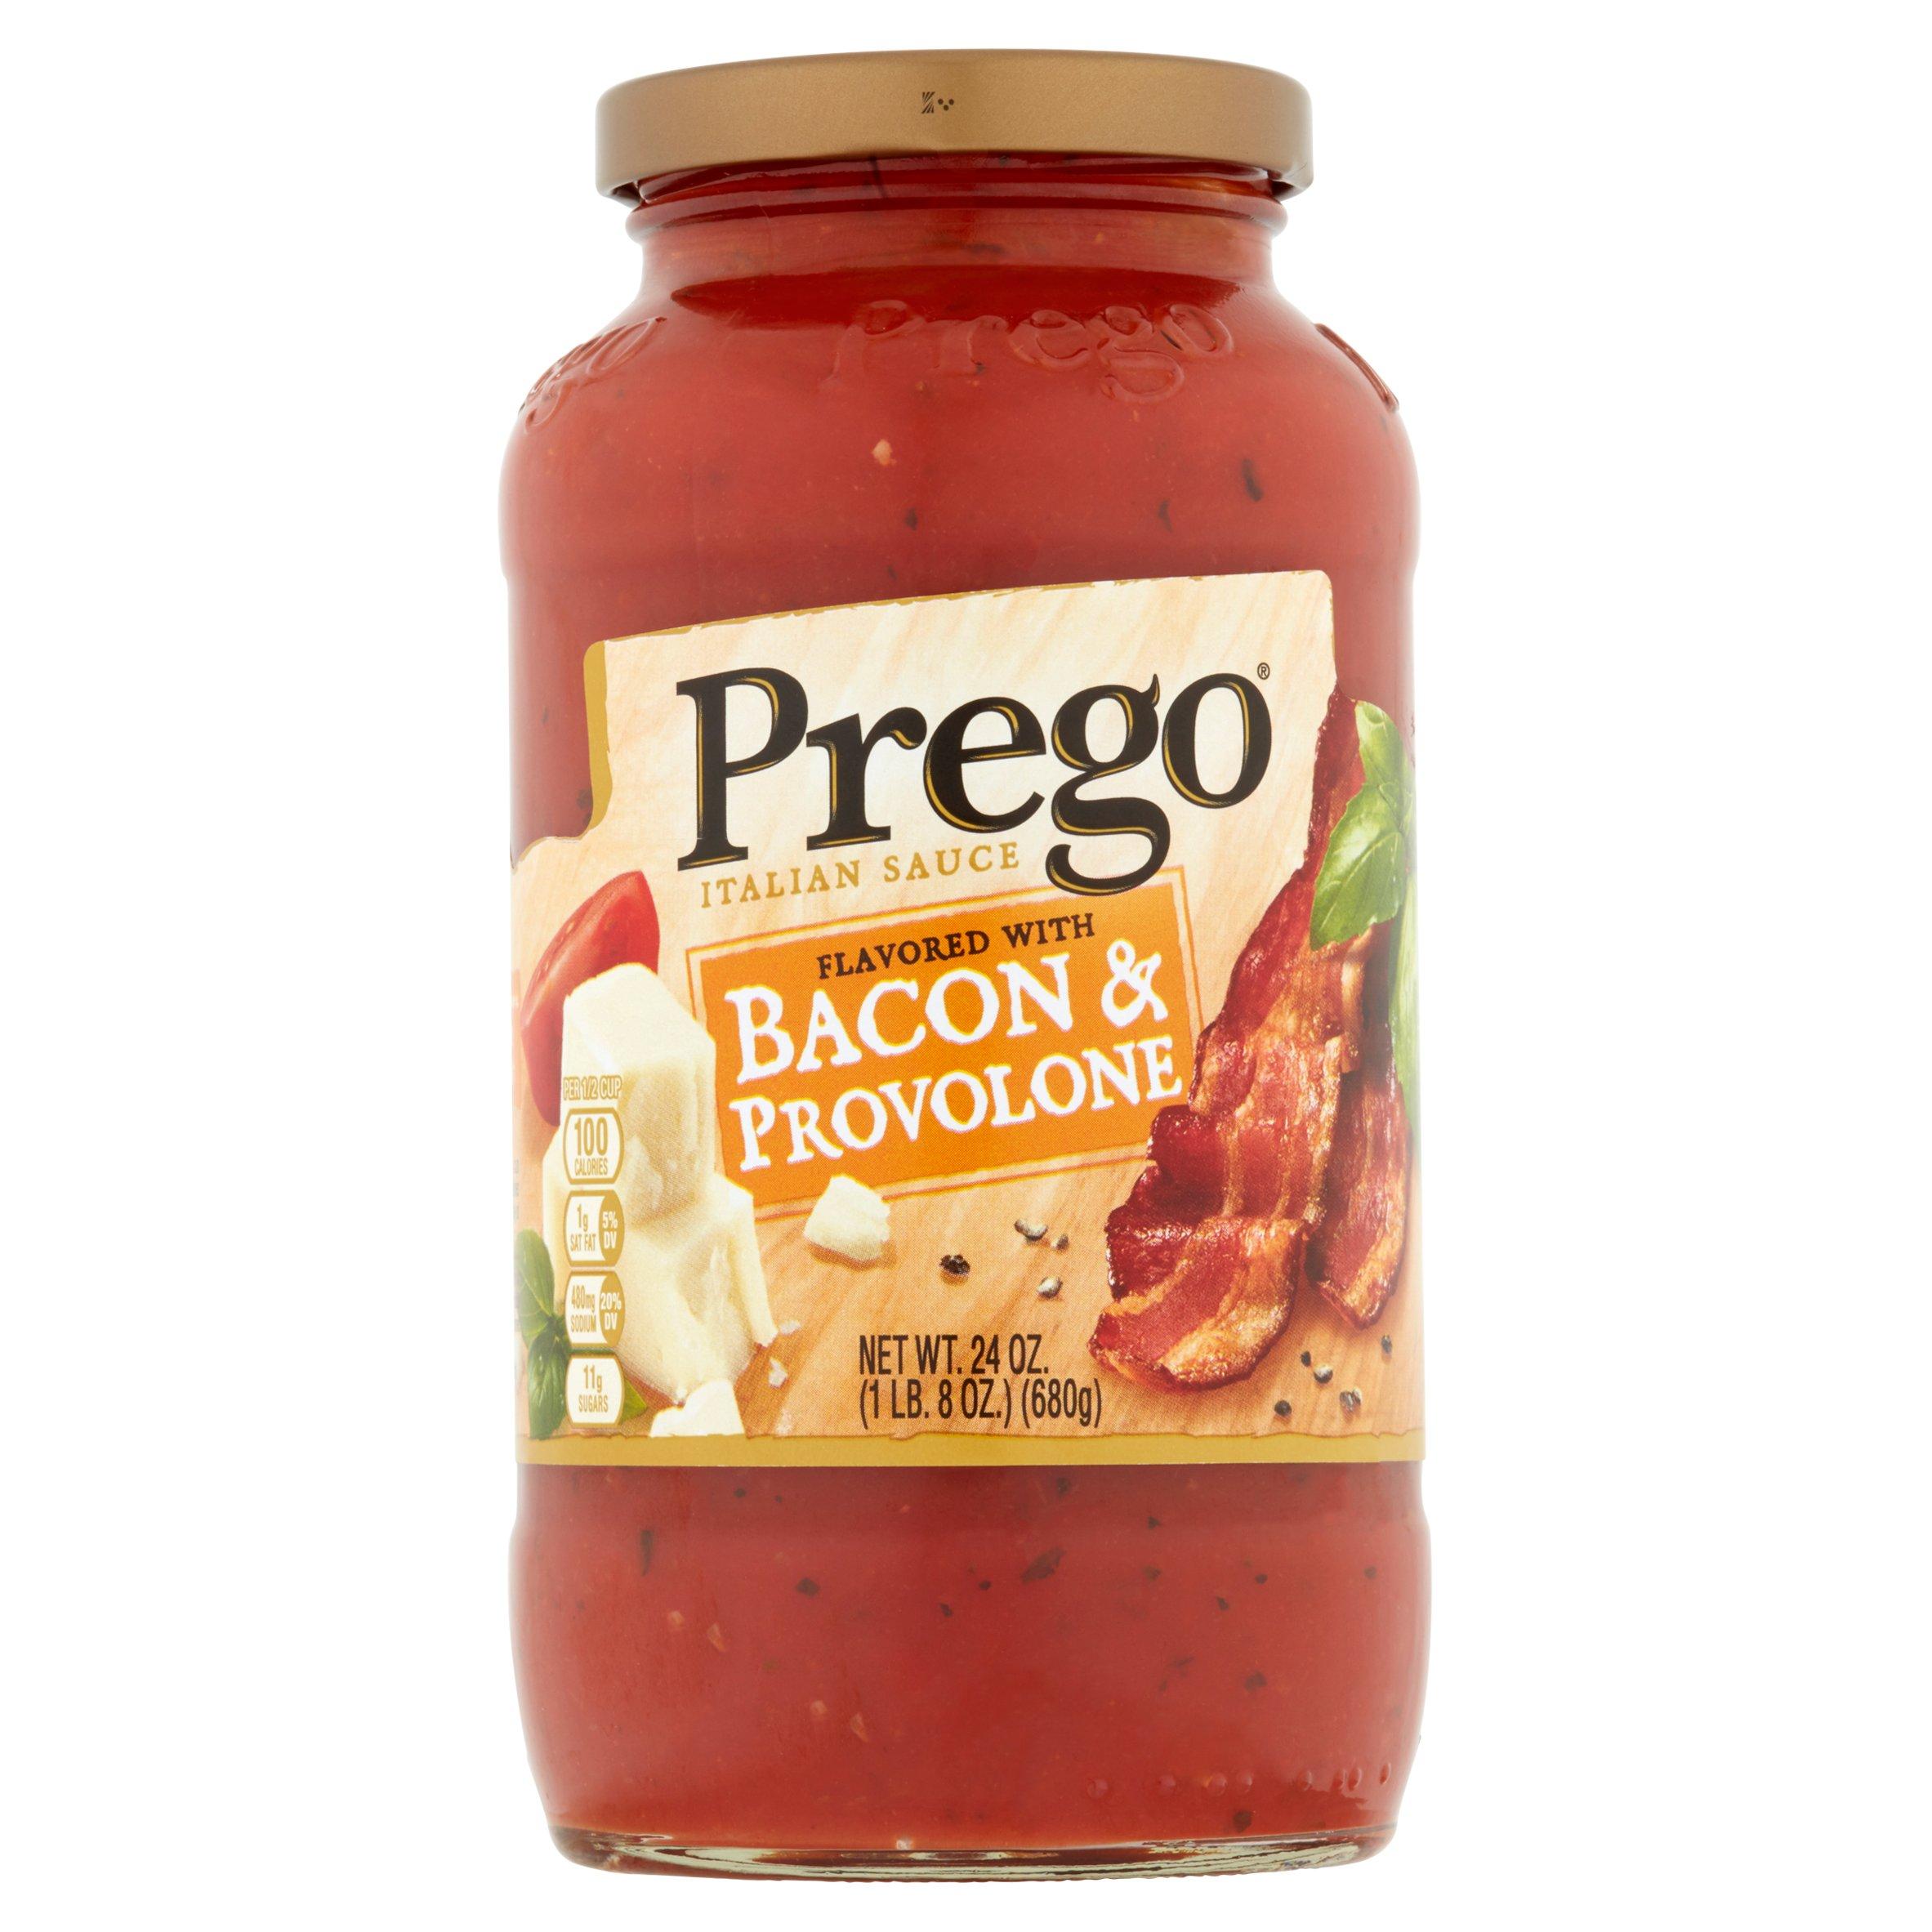 Prego Bacon & Provolone Italian Sauce, 24 oz by Campbell Soup Company